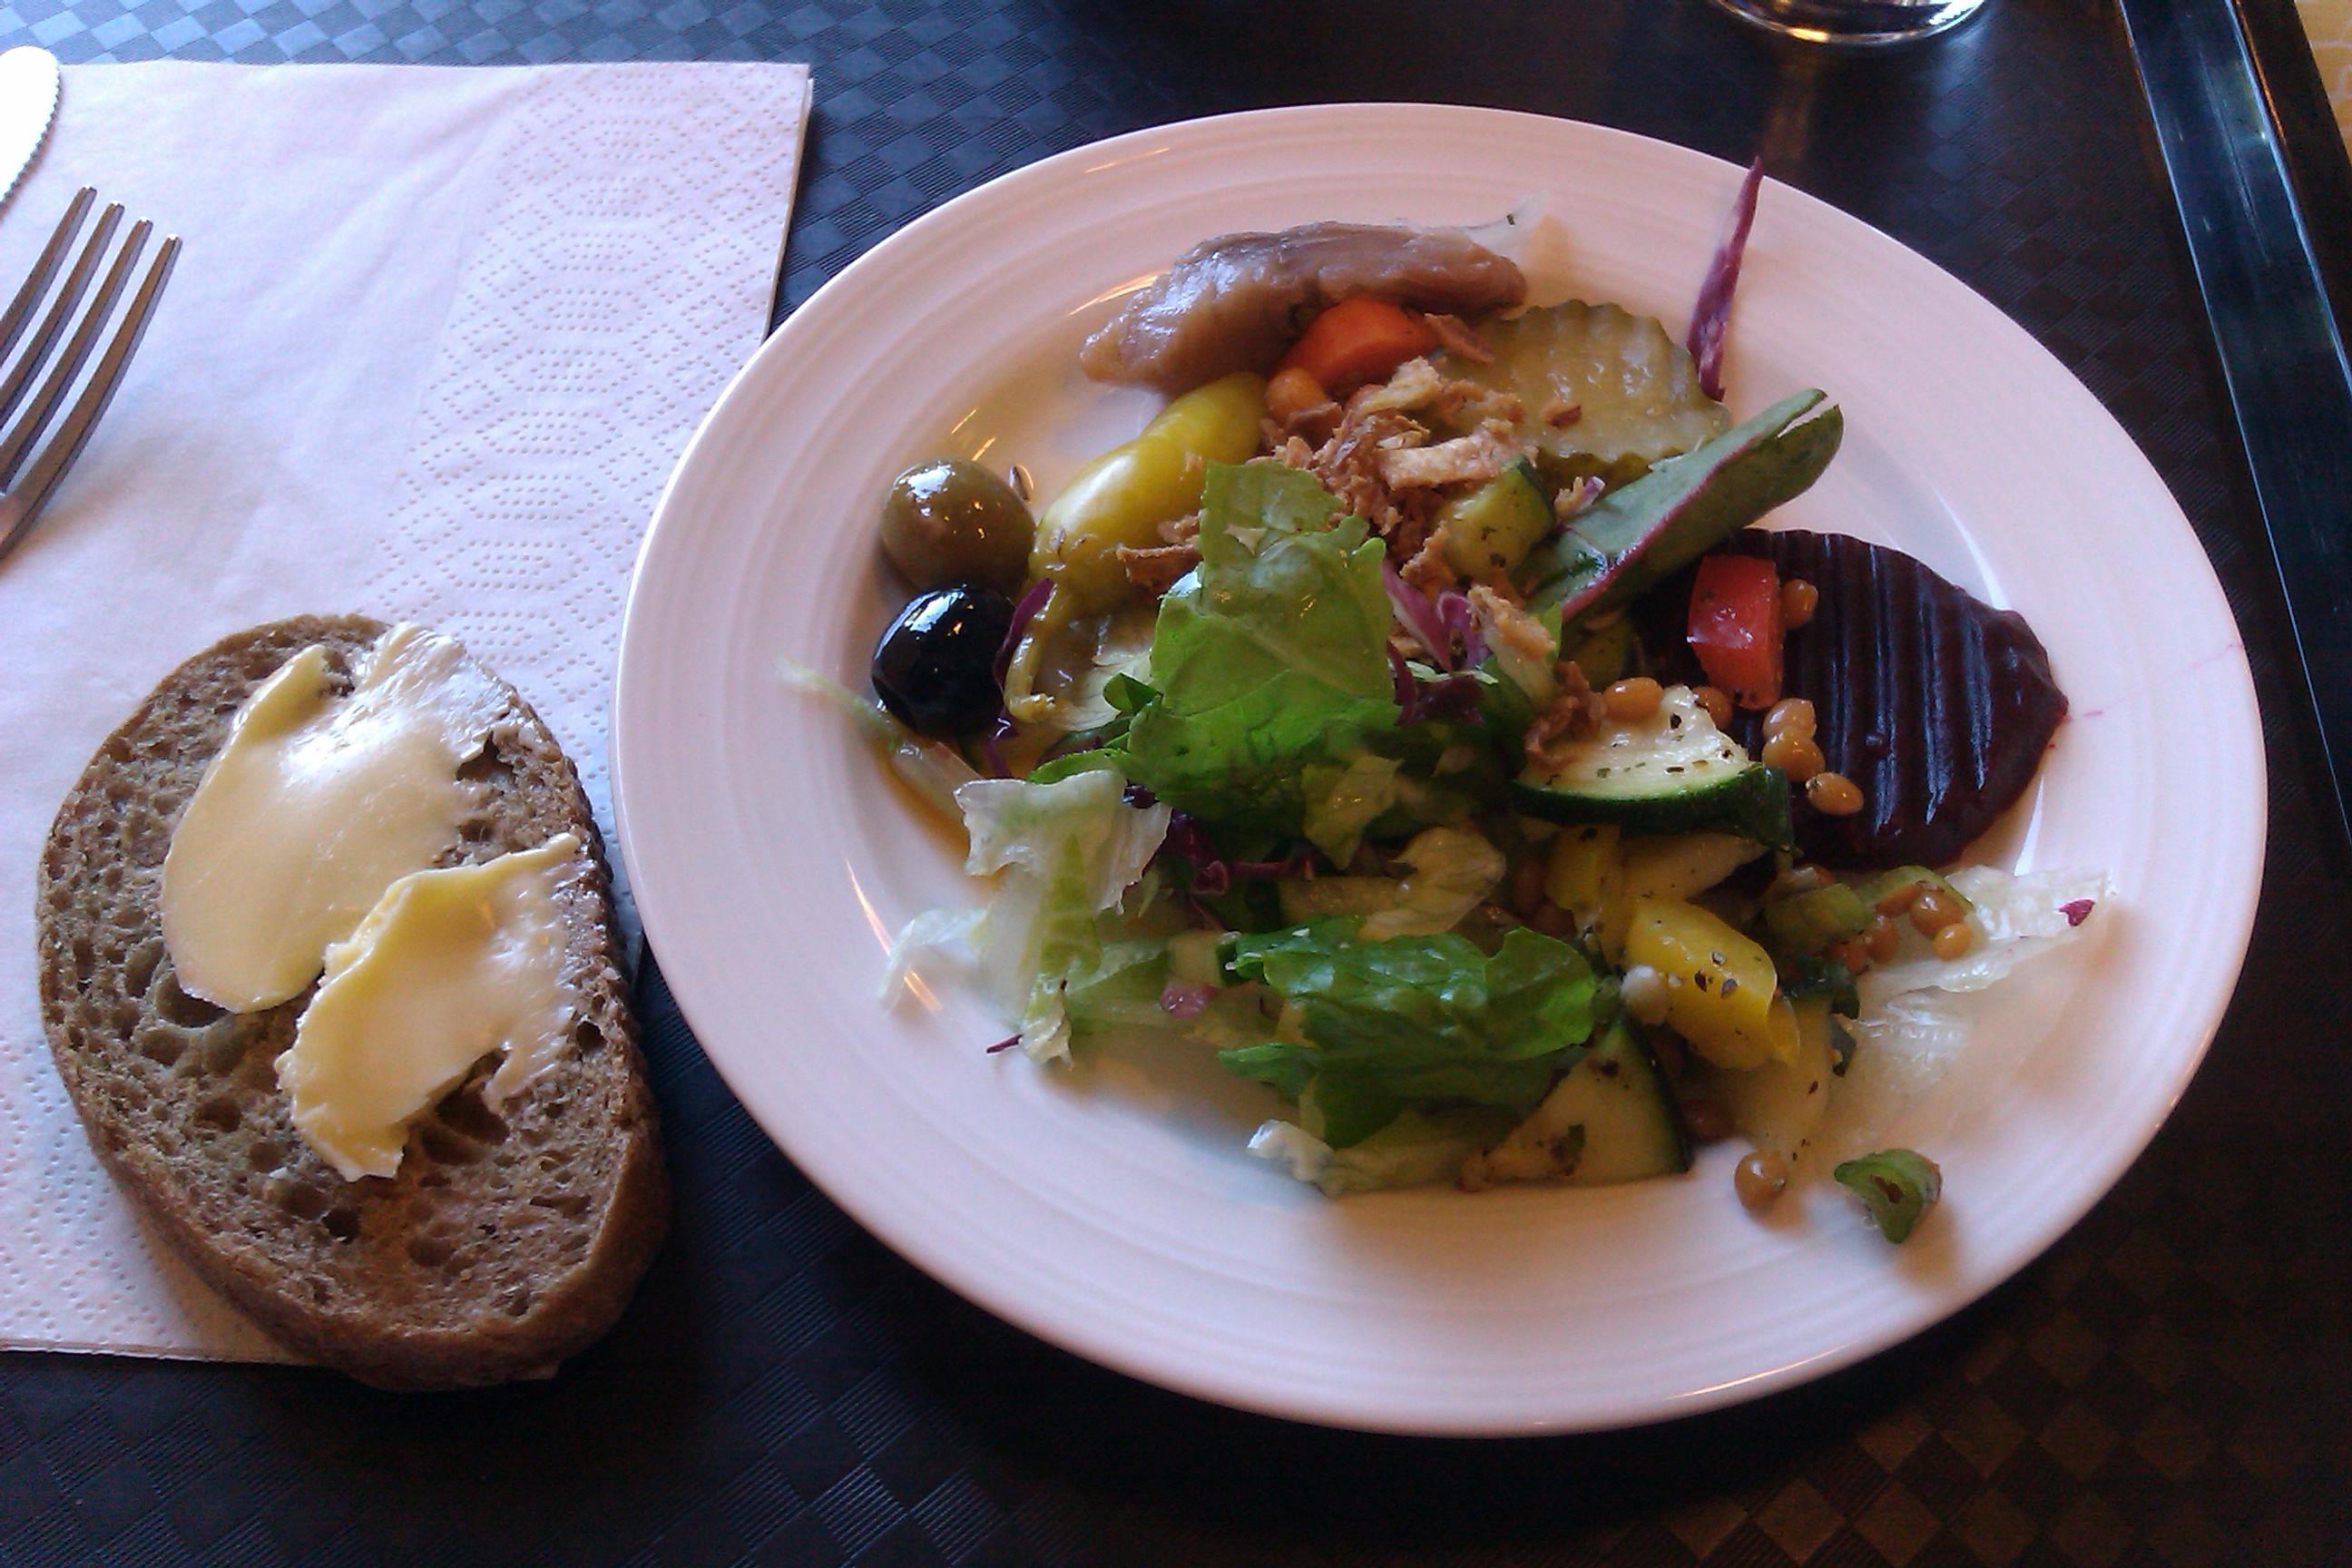 Twinstar Cafe, Porvoo: salaattipöydän antimia